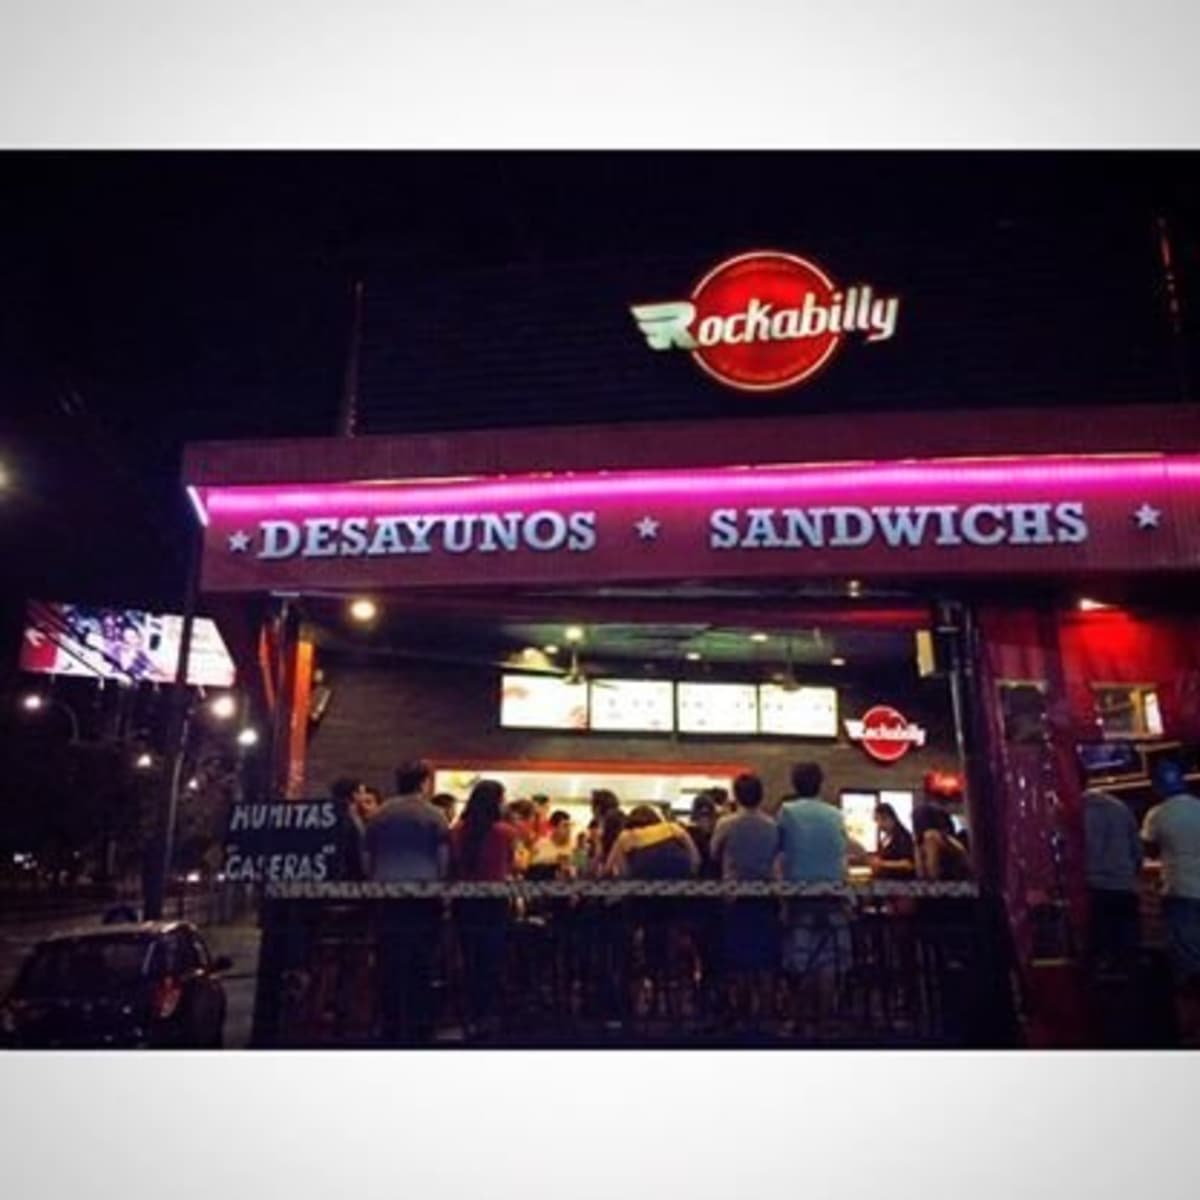 Hamburguesas rockabilly en av la florida n 9321 - Rockabilly fotoshooting hamburg ...